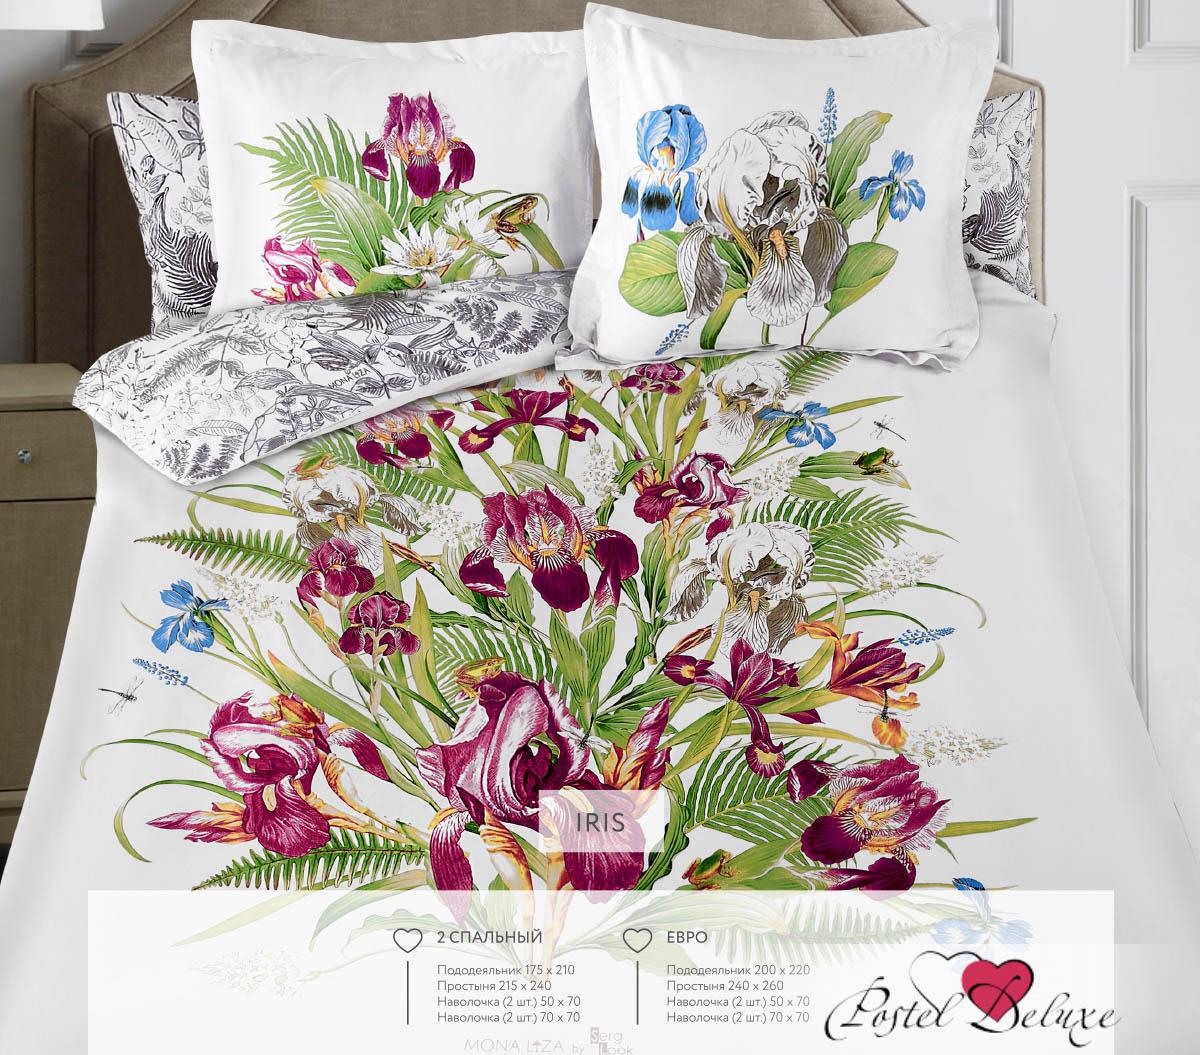 Постельное белье Mona Liza Постельное белье Iris (2 сп. евро) комплект пб 2 сп mona liza сатин жаккард royal 4 нав 2шт 70х70 и 2 шт